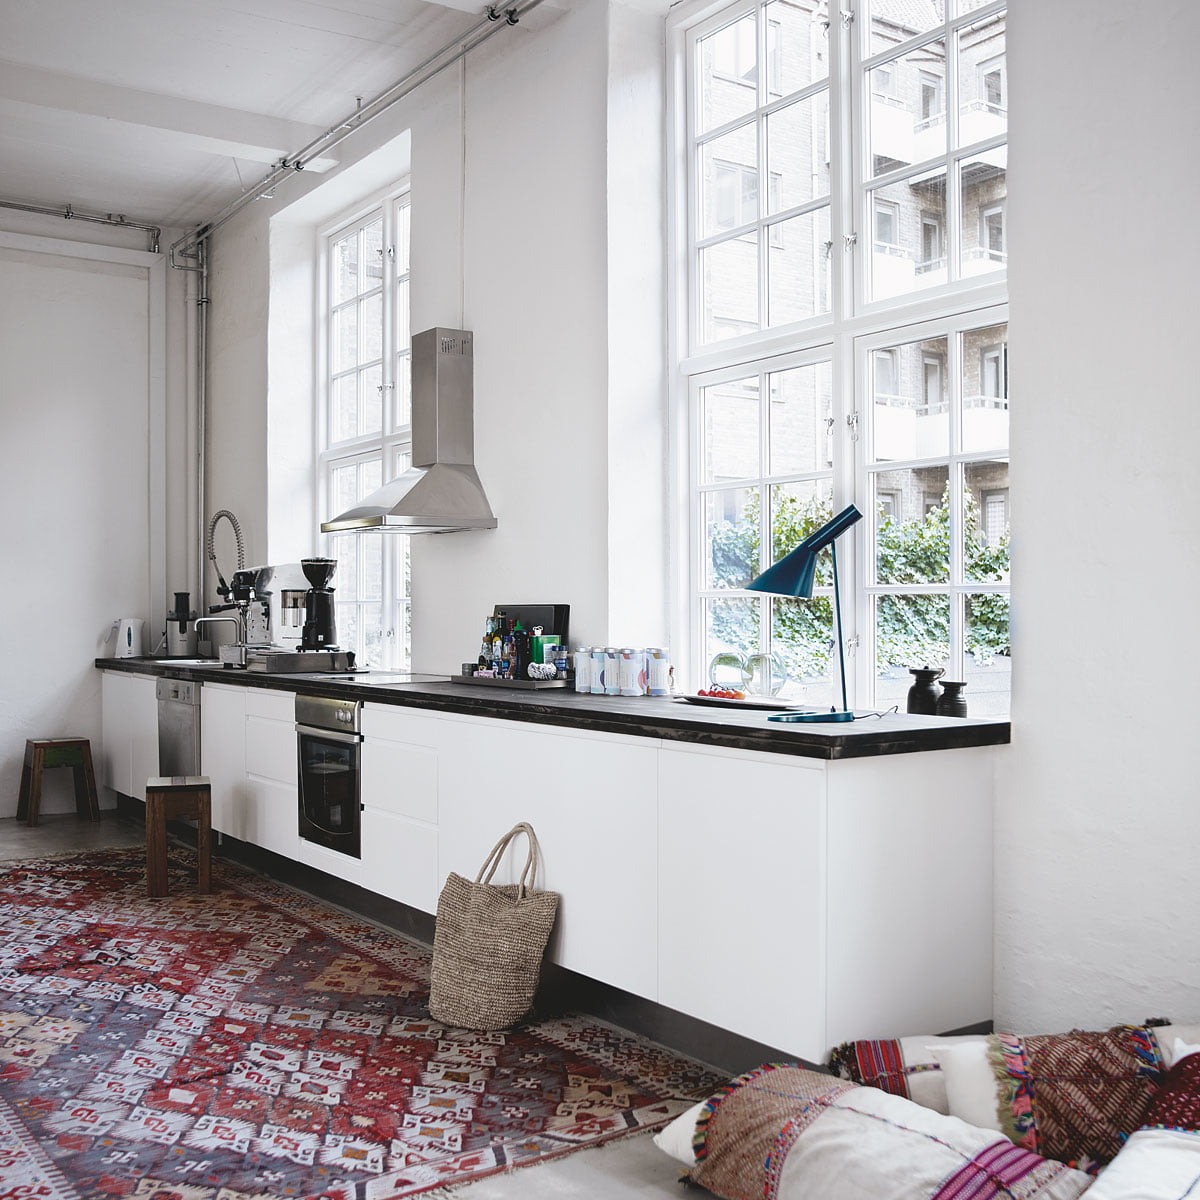 aj tischleuchte von louis poulsen connox. Black Bedroom Furniture Sets. Home Design Ideas